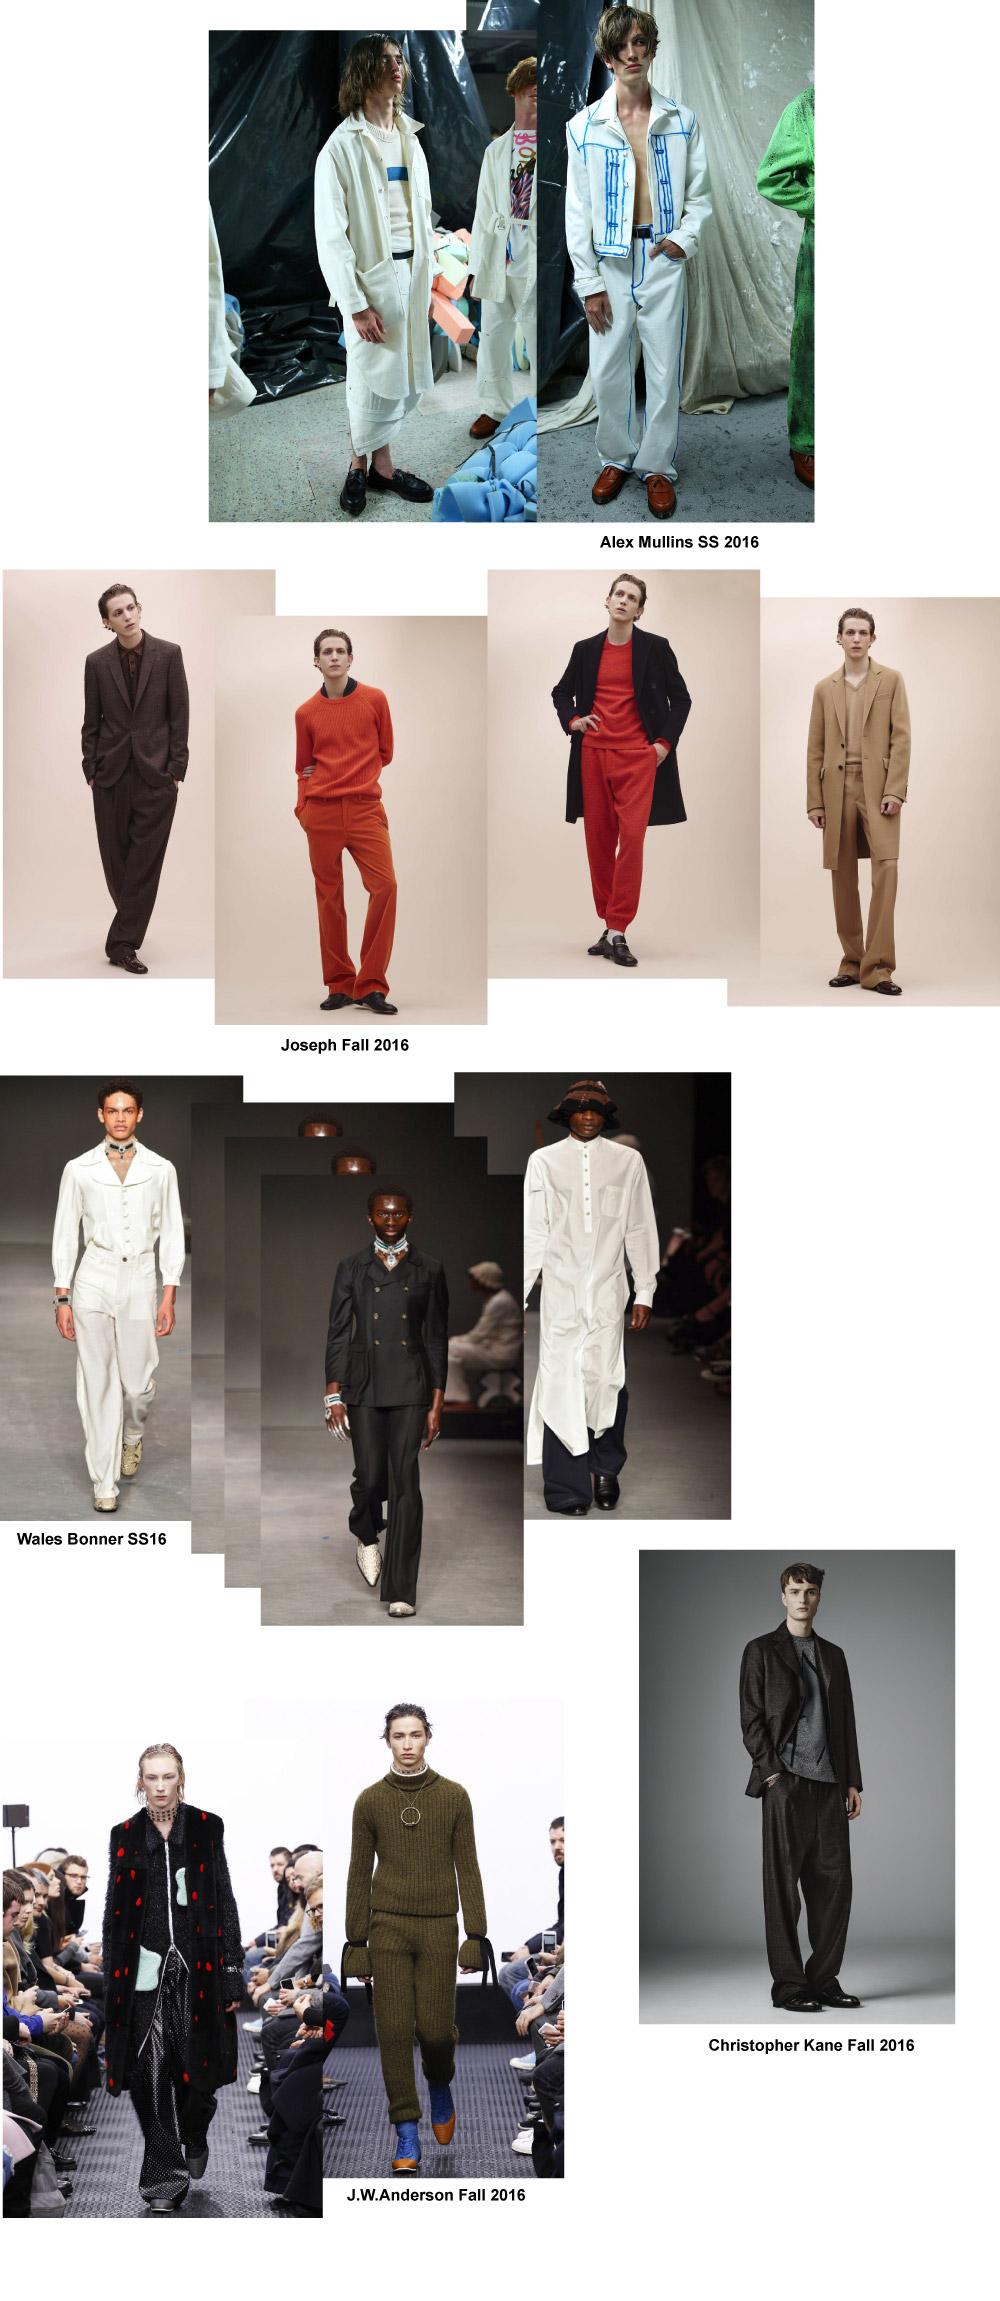 London Fashion week Brogues selection